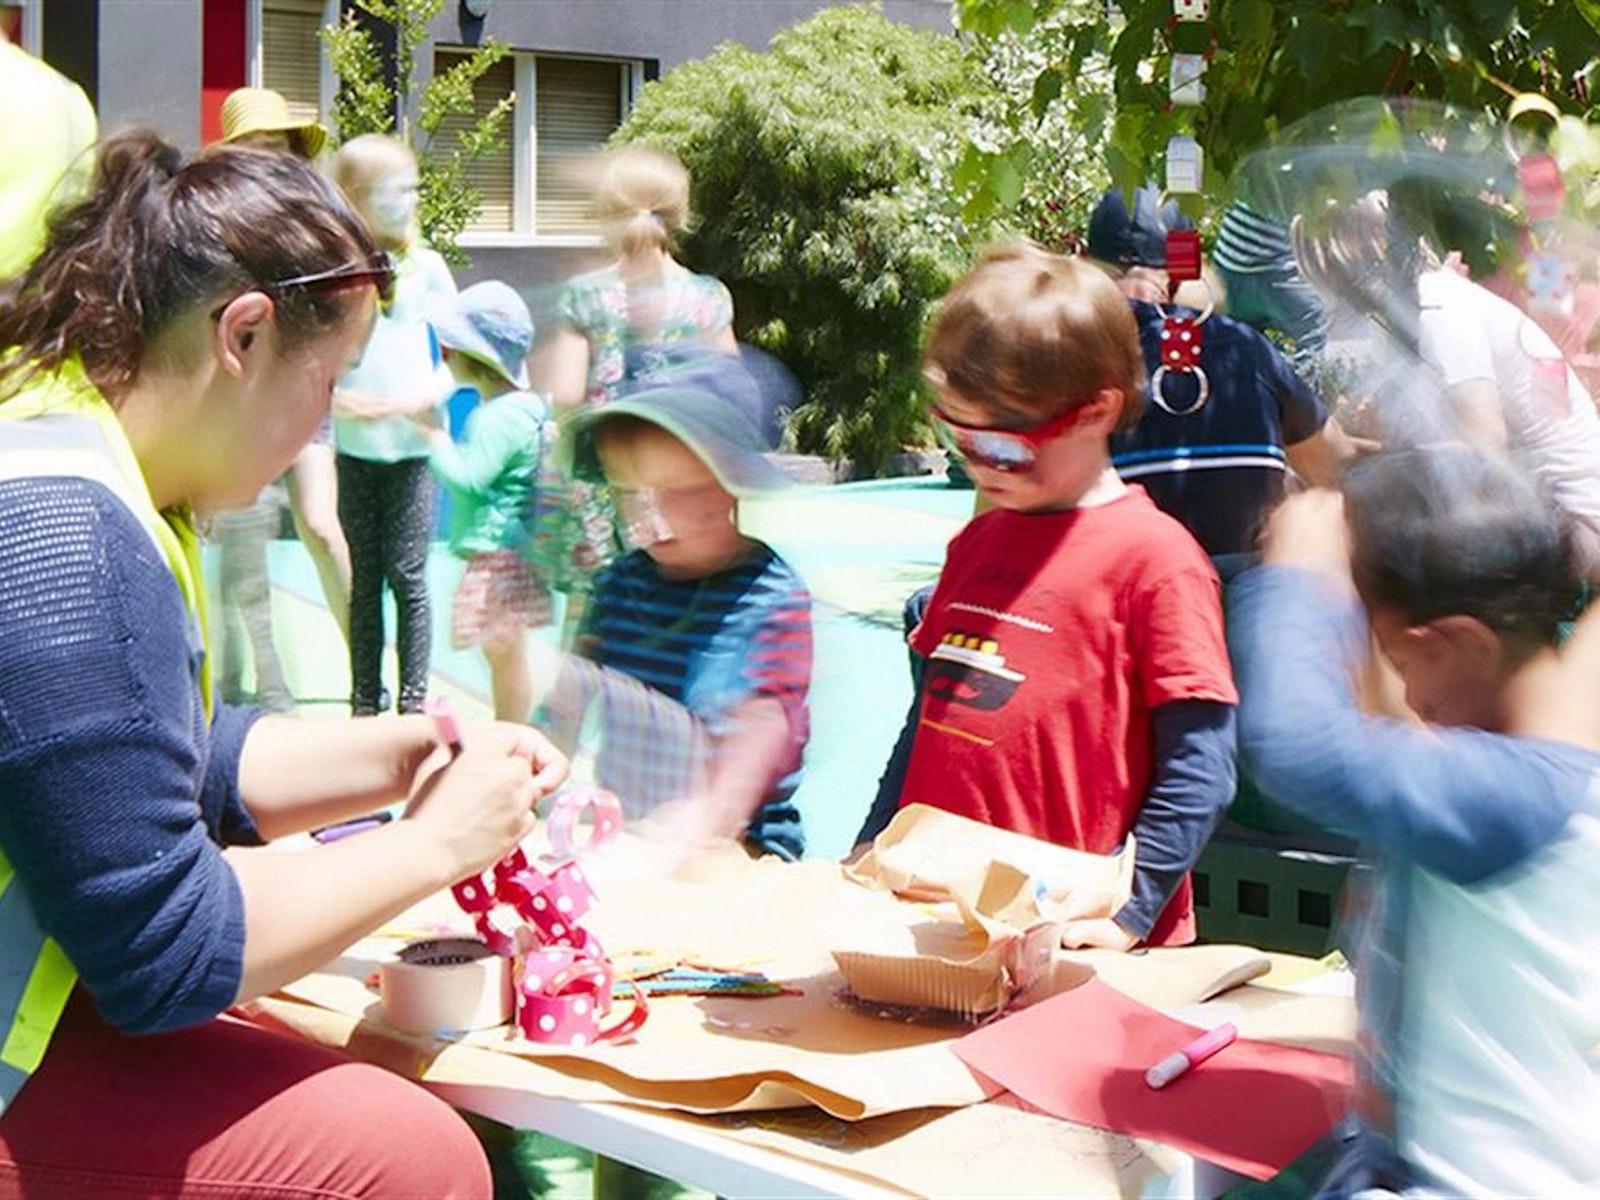 People & place: A DIY neighbourhood social experiment with CoDesign studio (part II)